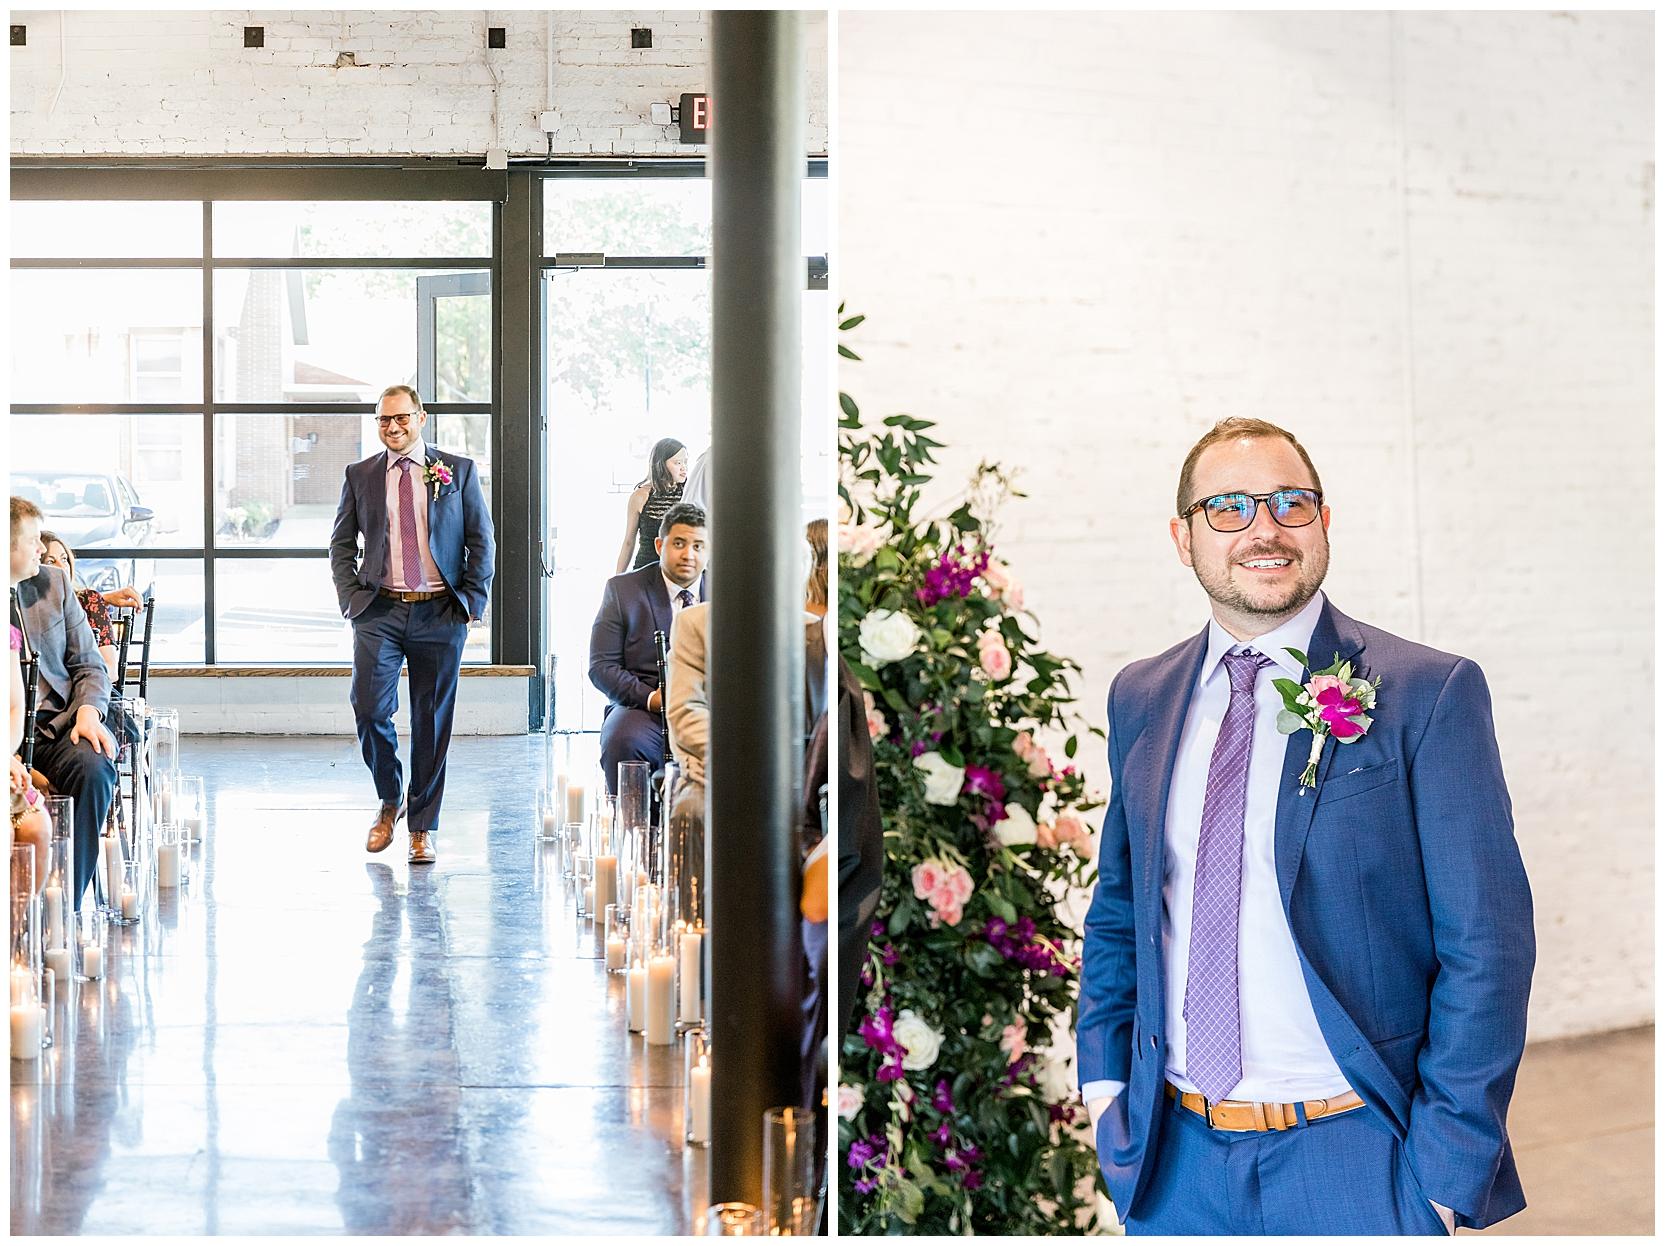 jessicafredericks_lakeland_tampa_wedding_purple_crazy hour_0043.jpg